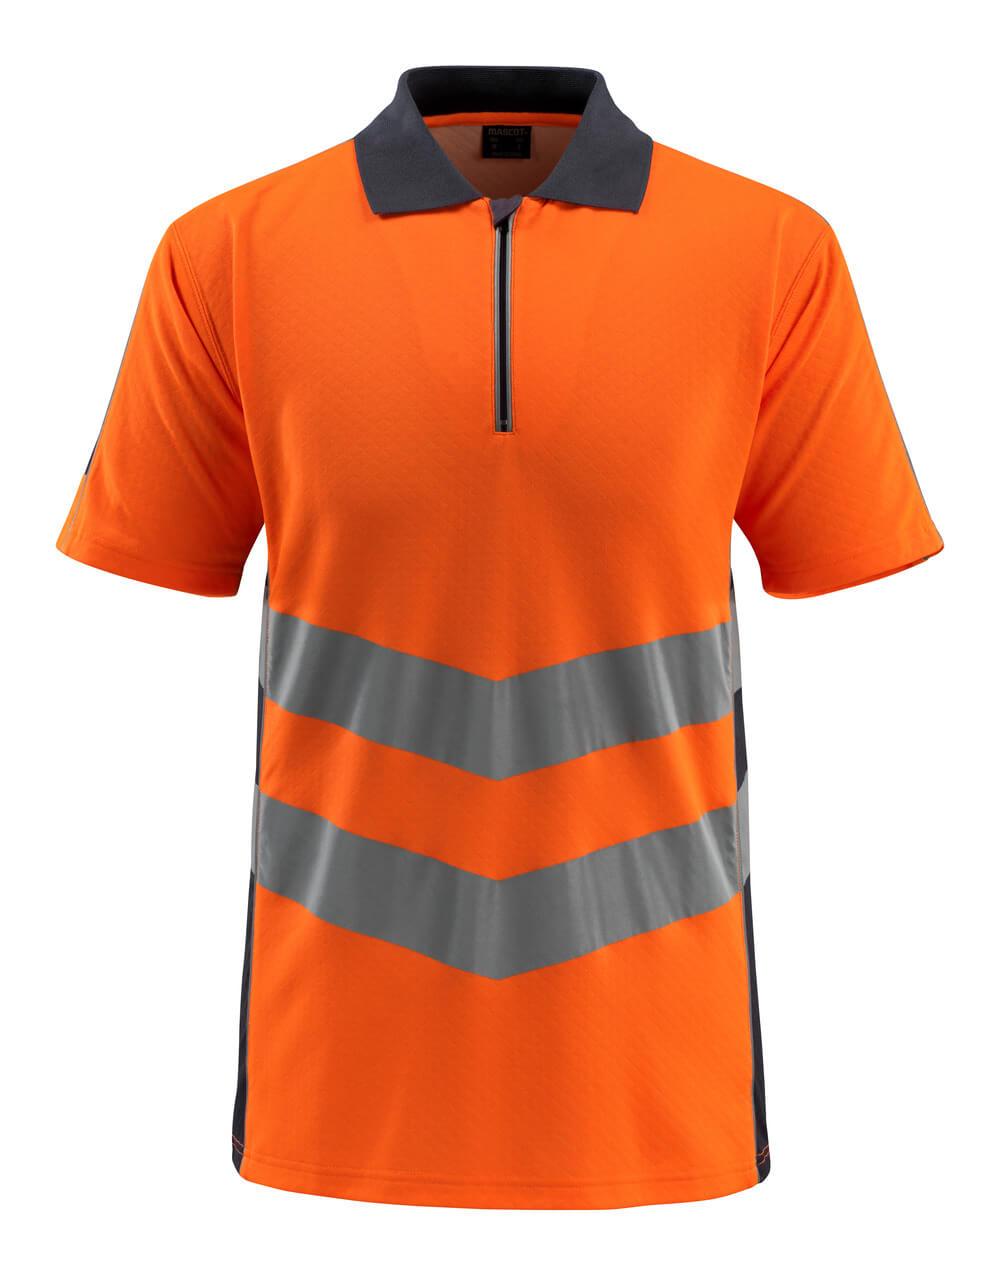 50130-933-14010 Poloshirt - hi-vis orange/mørk marine